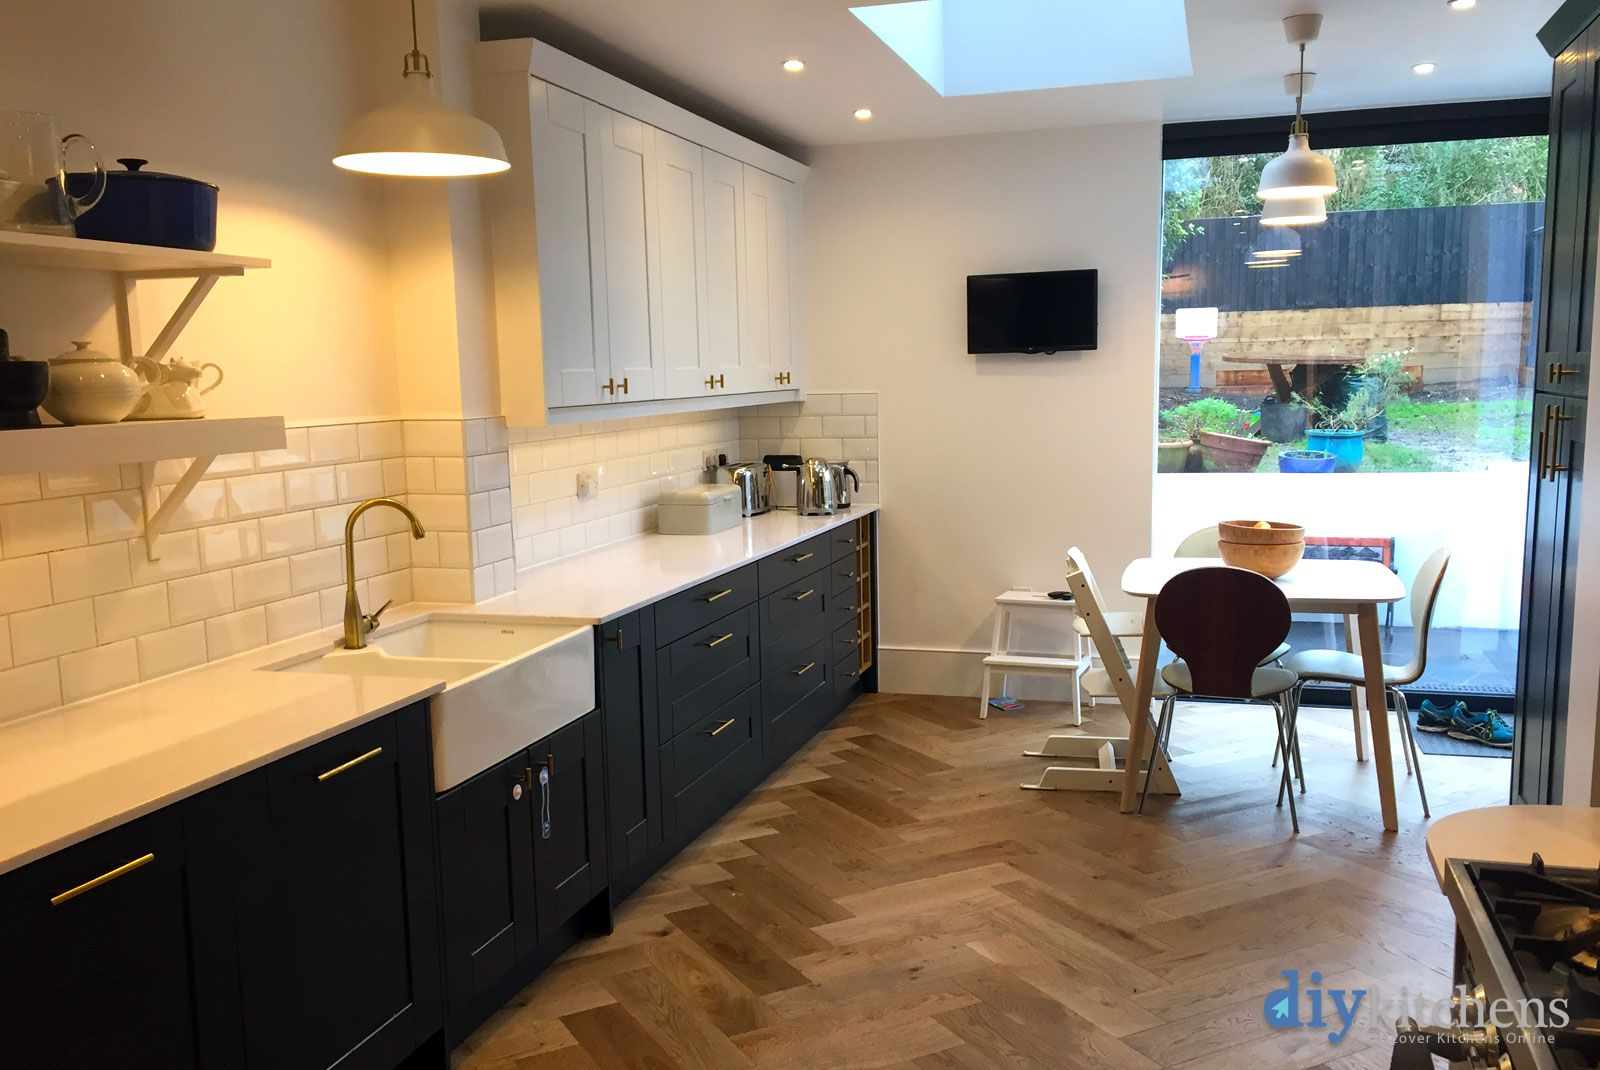 An Innova Linwood Bespoke Painted Shaker Kitchen Diy Kitchen